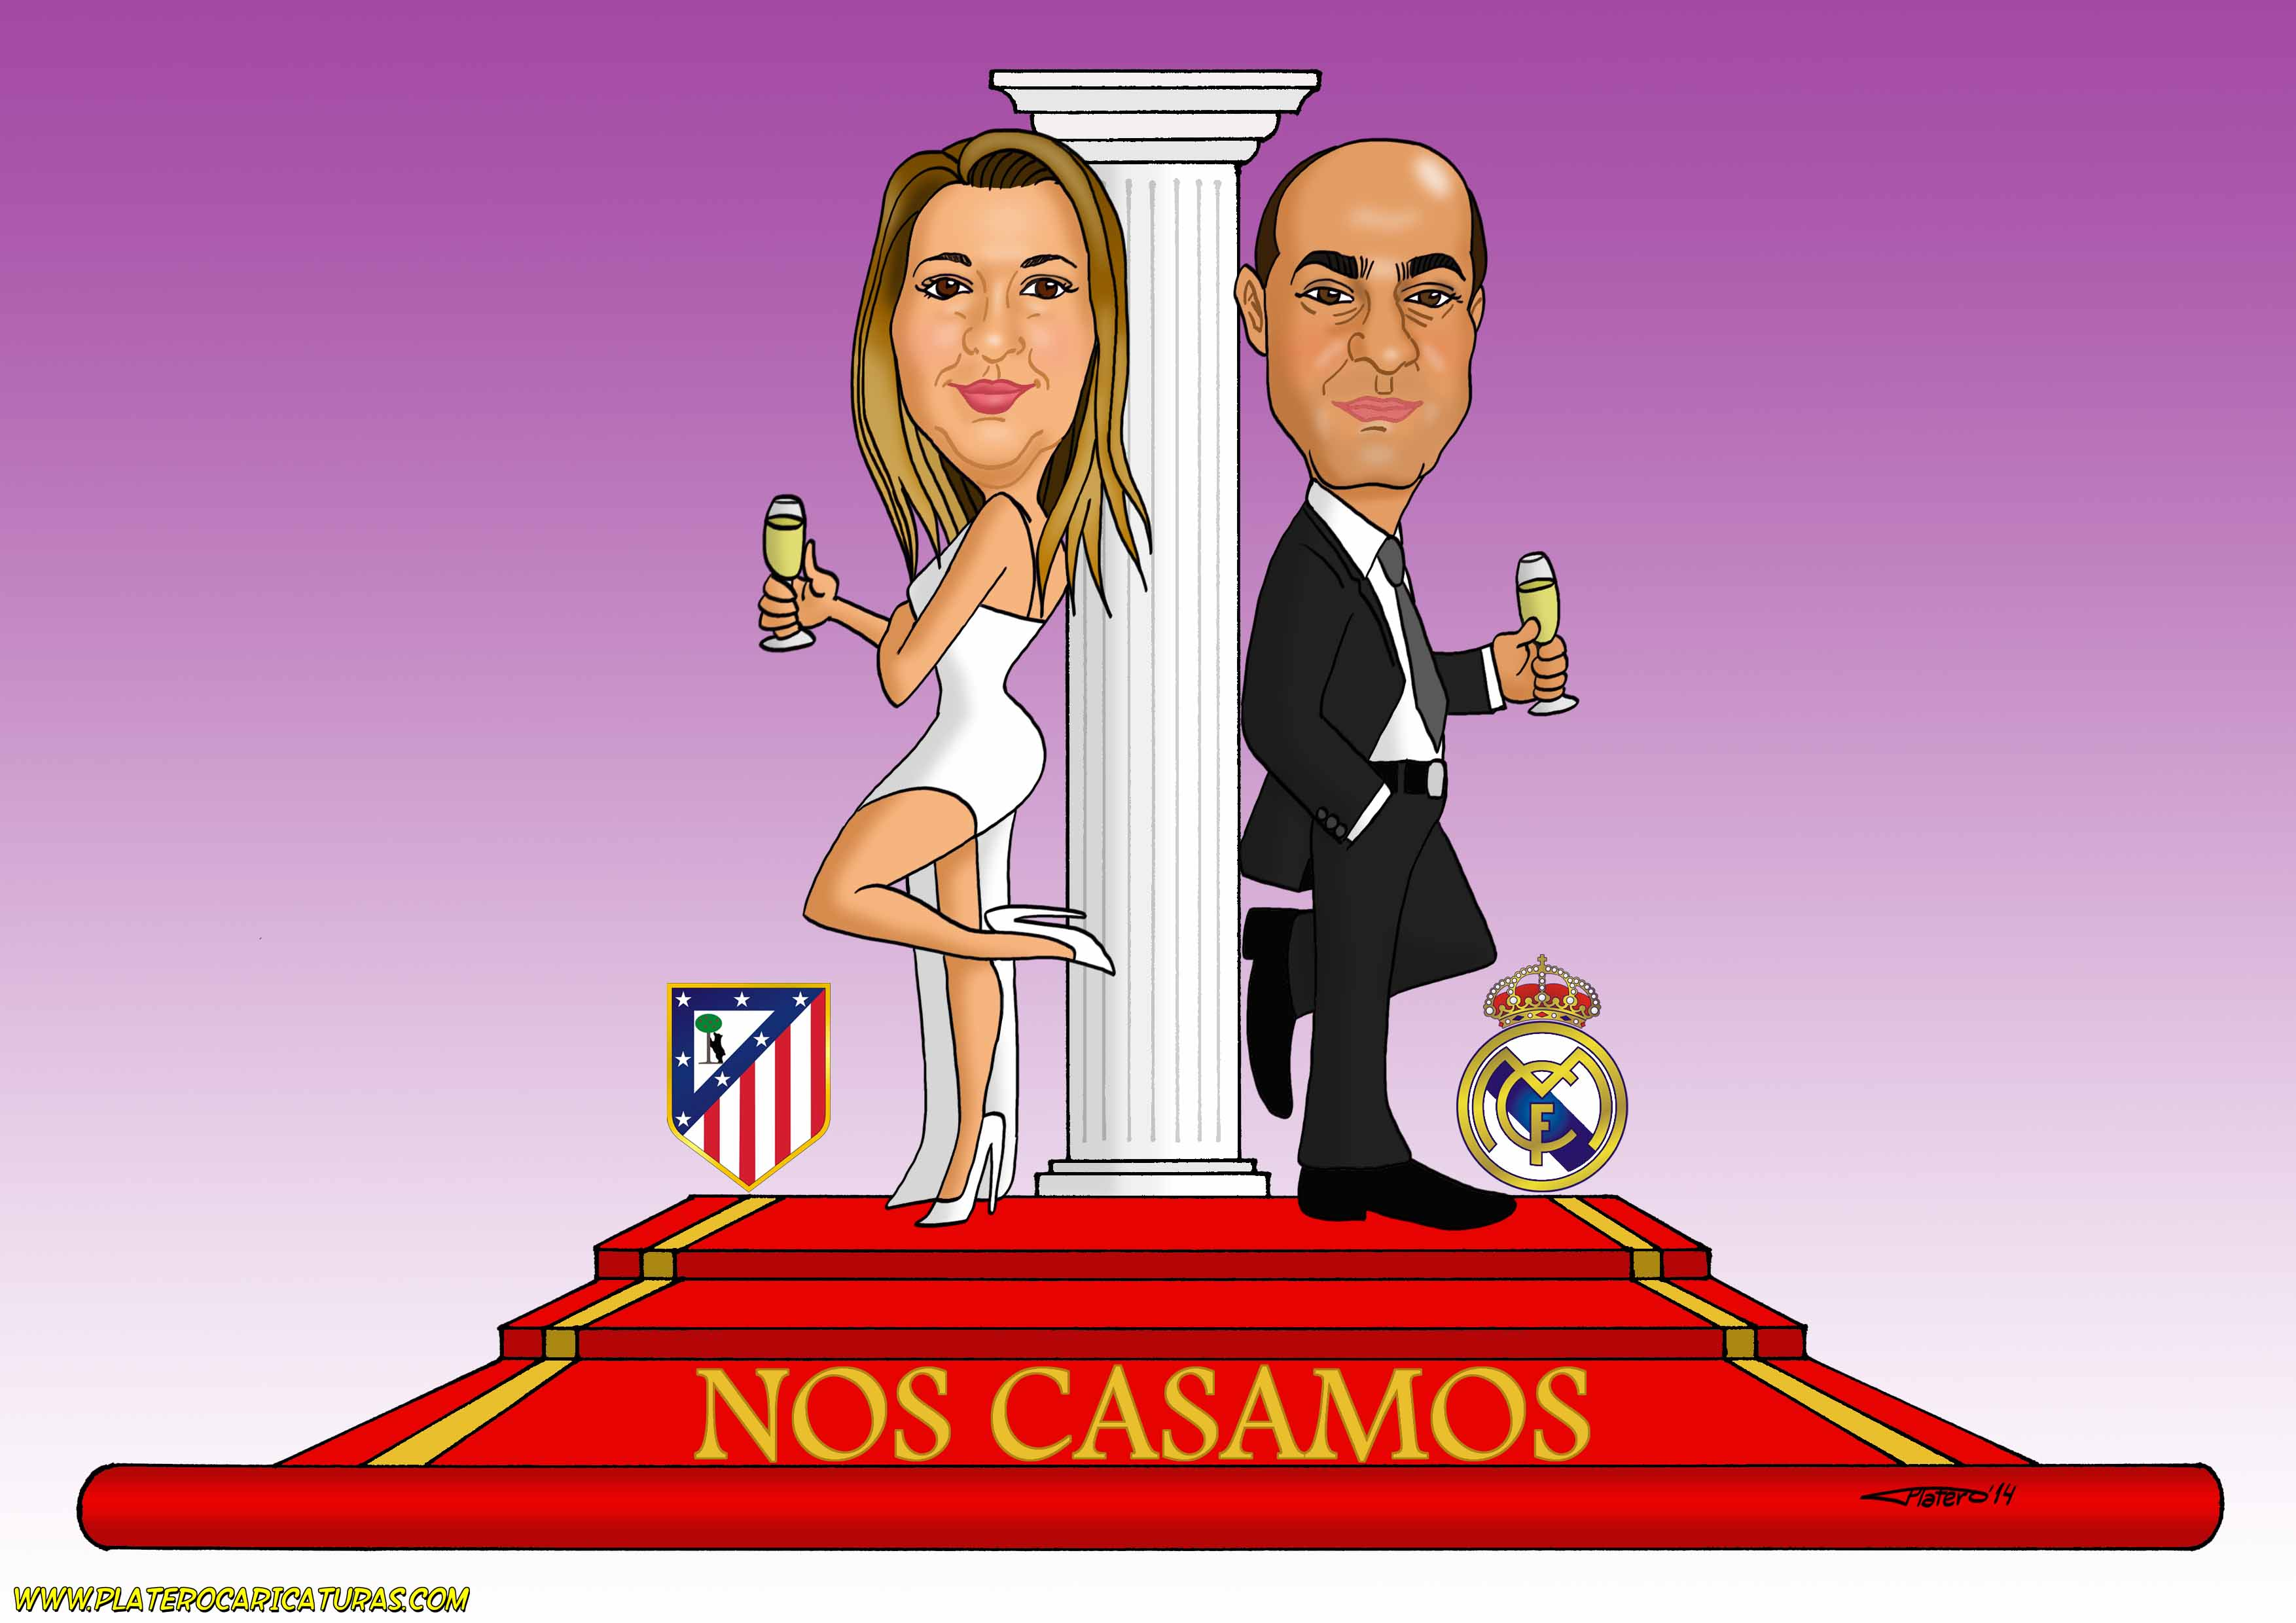 caricaturas_a_color_por_encargo_personalizadas_novios_equipos_de_fútbol_boda_elm